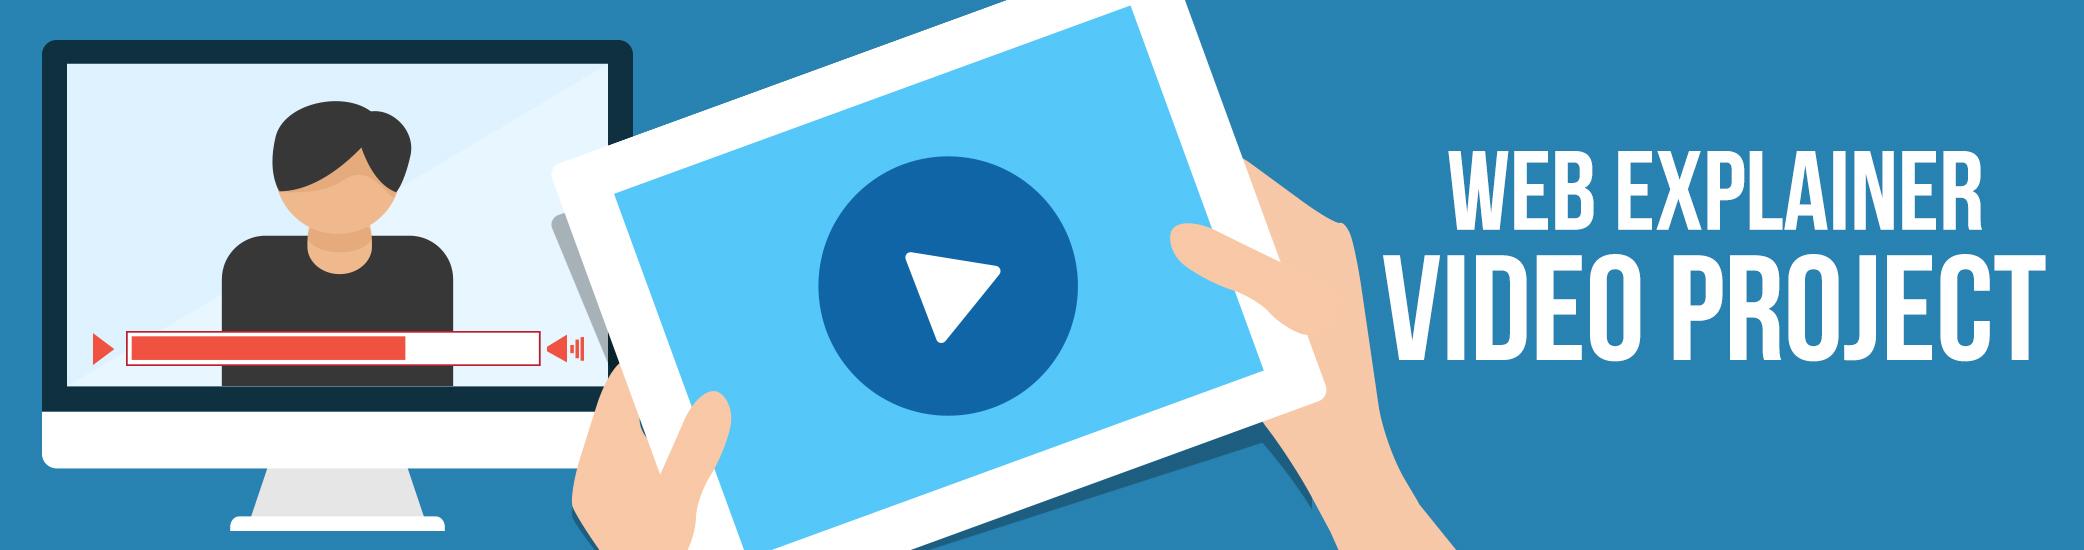 Web Explainer Video Project Banner